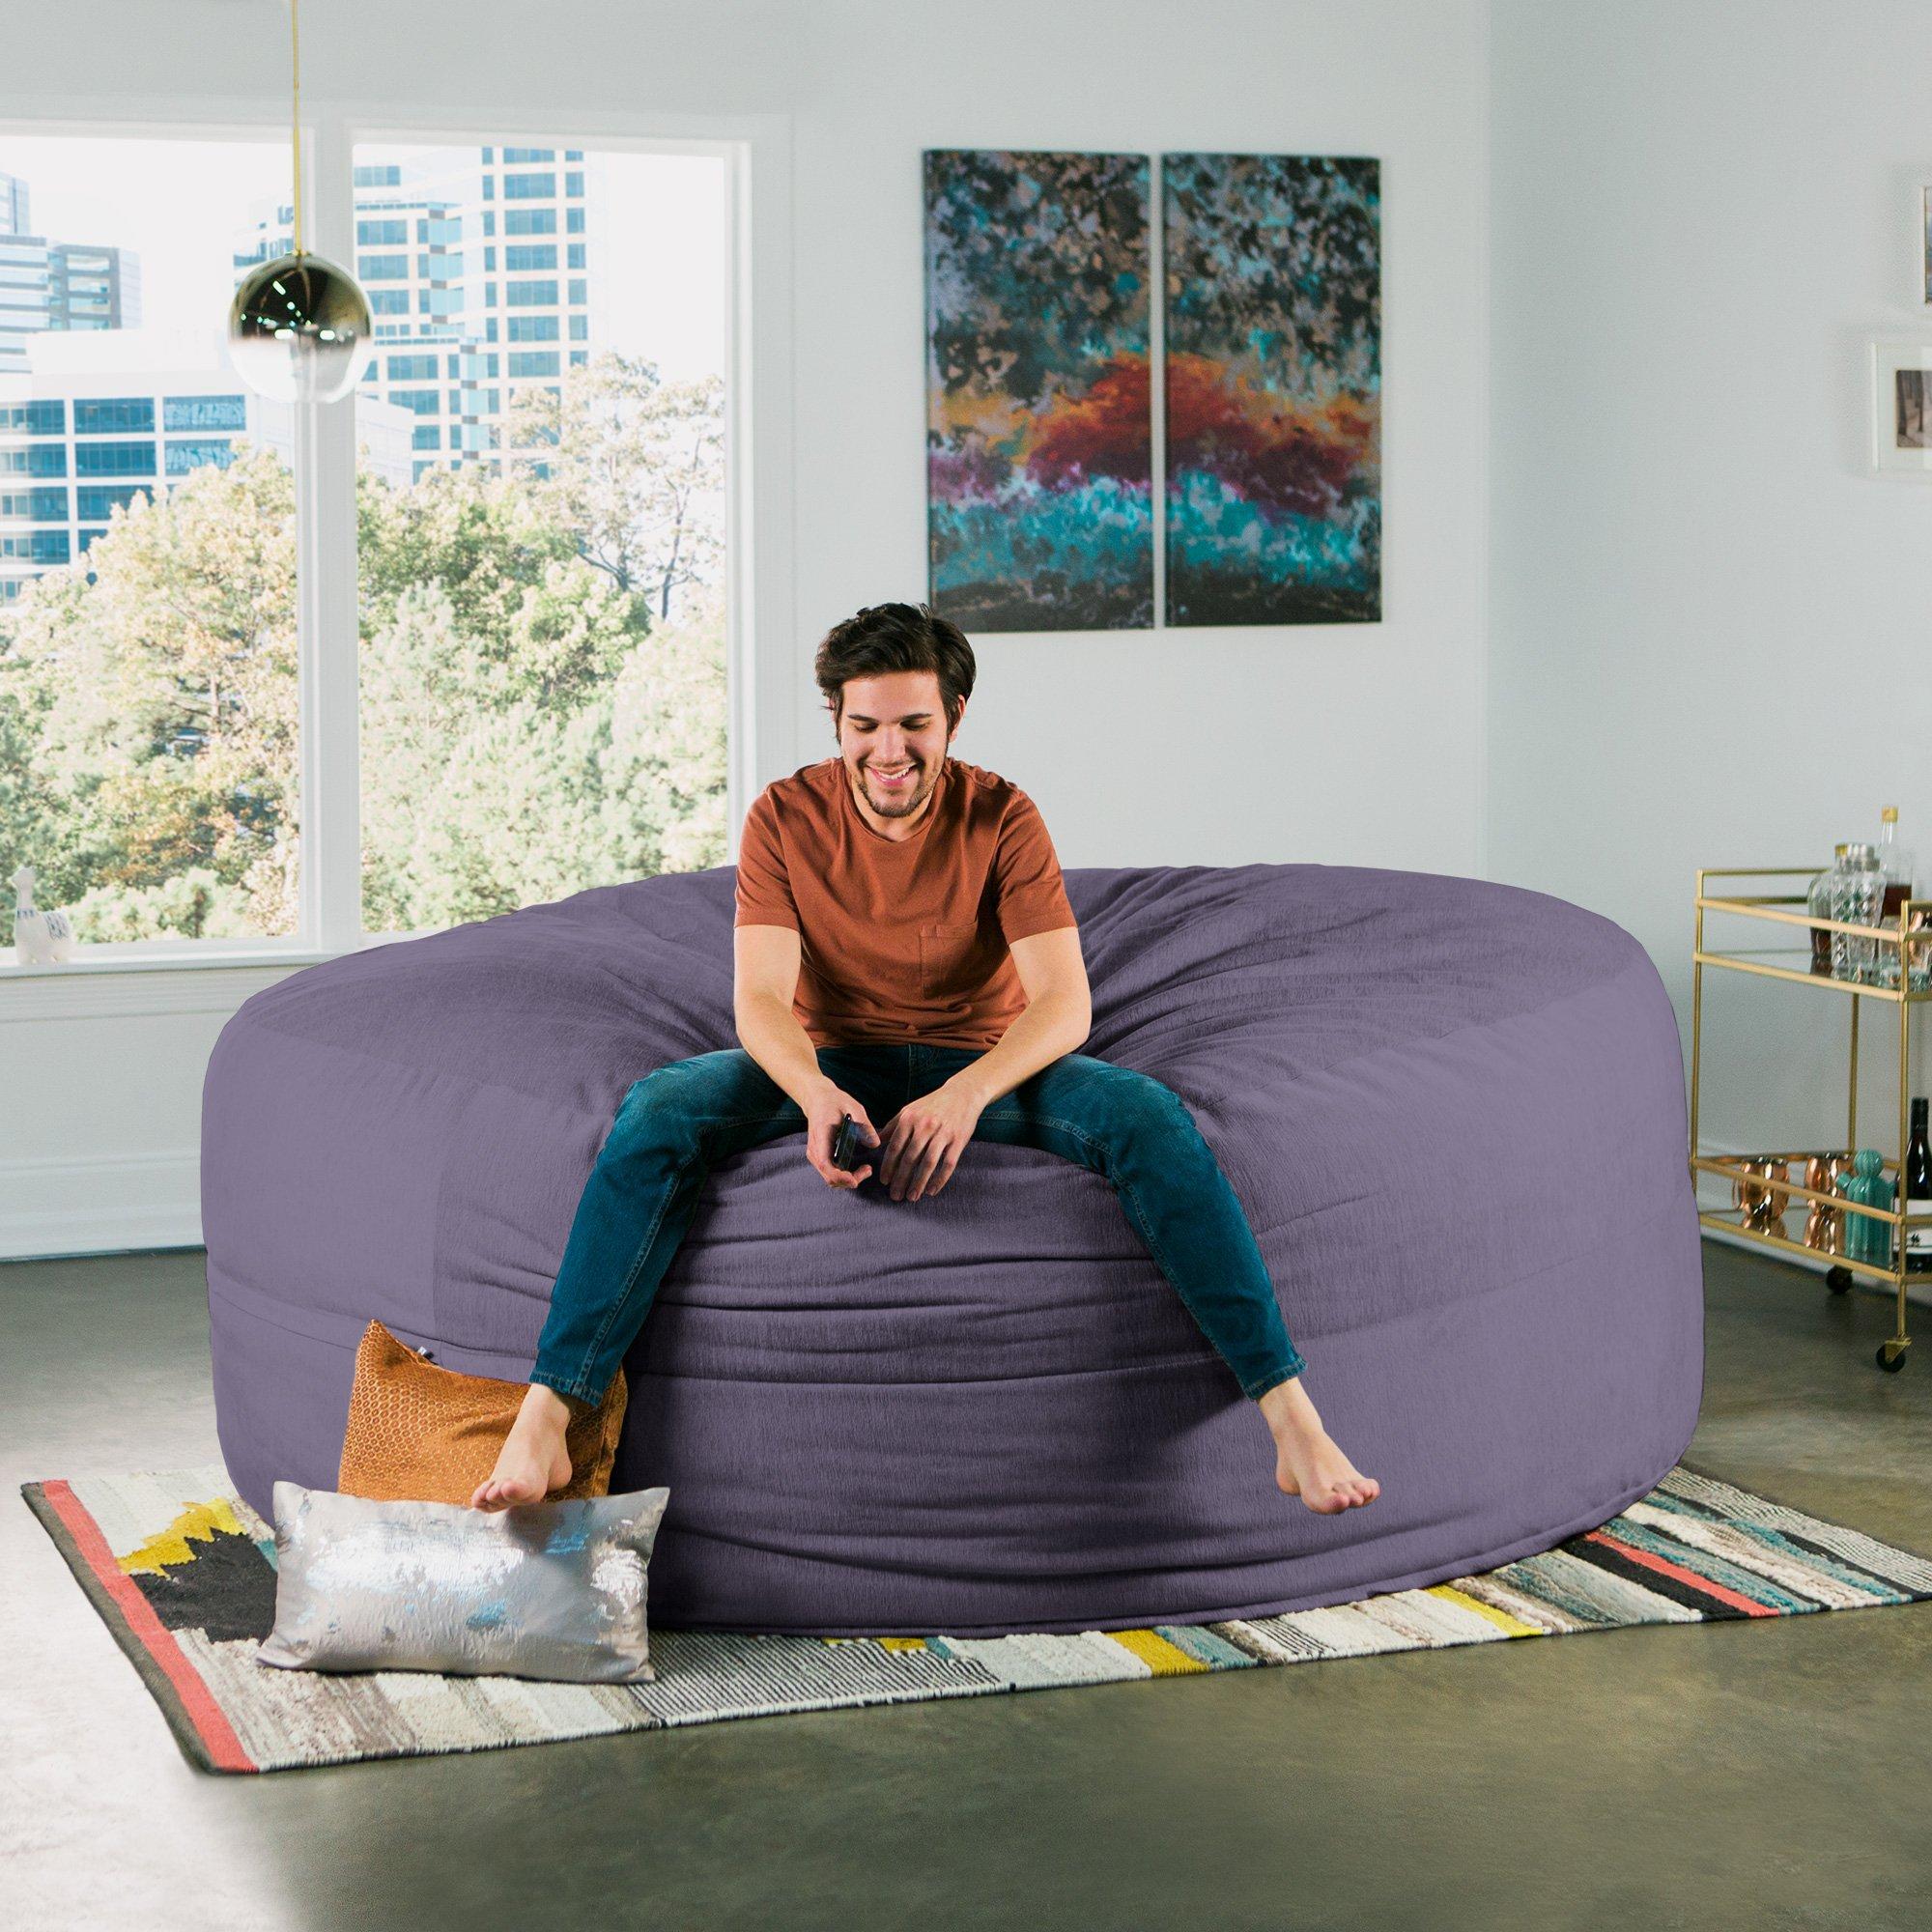 Jaxx Cocoon 8 Foot Huge Sleeper Bean Bag Bed - Chenille, Plum by Jaxx (Image #4)